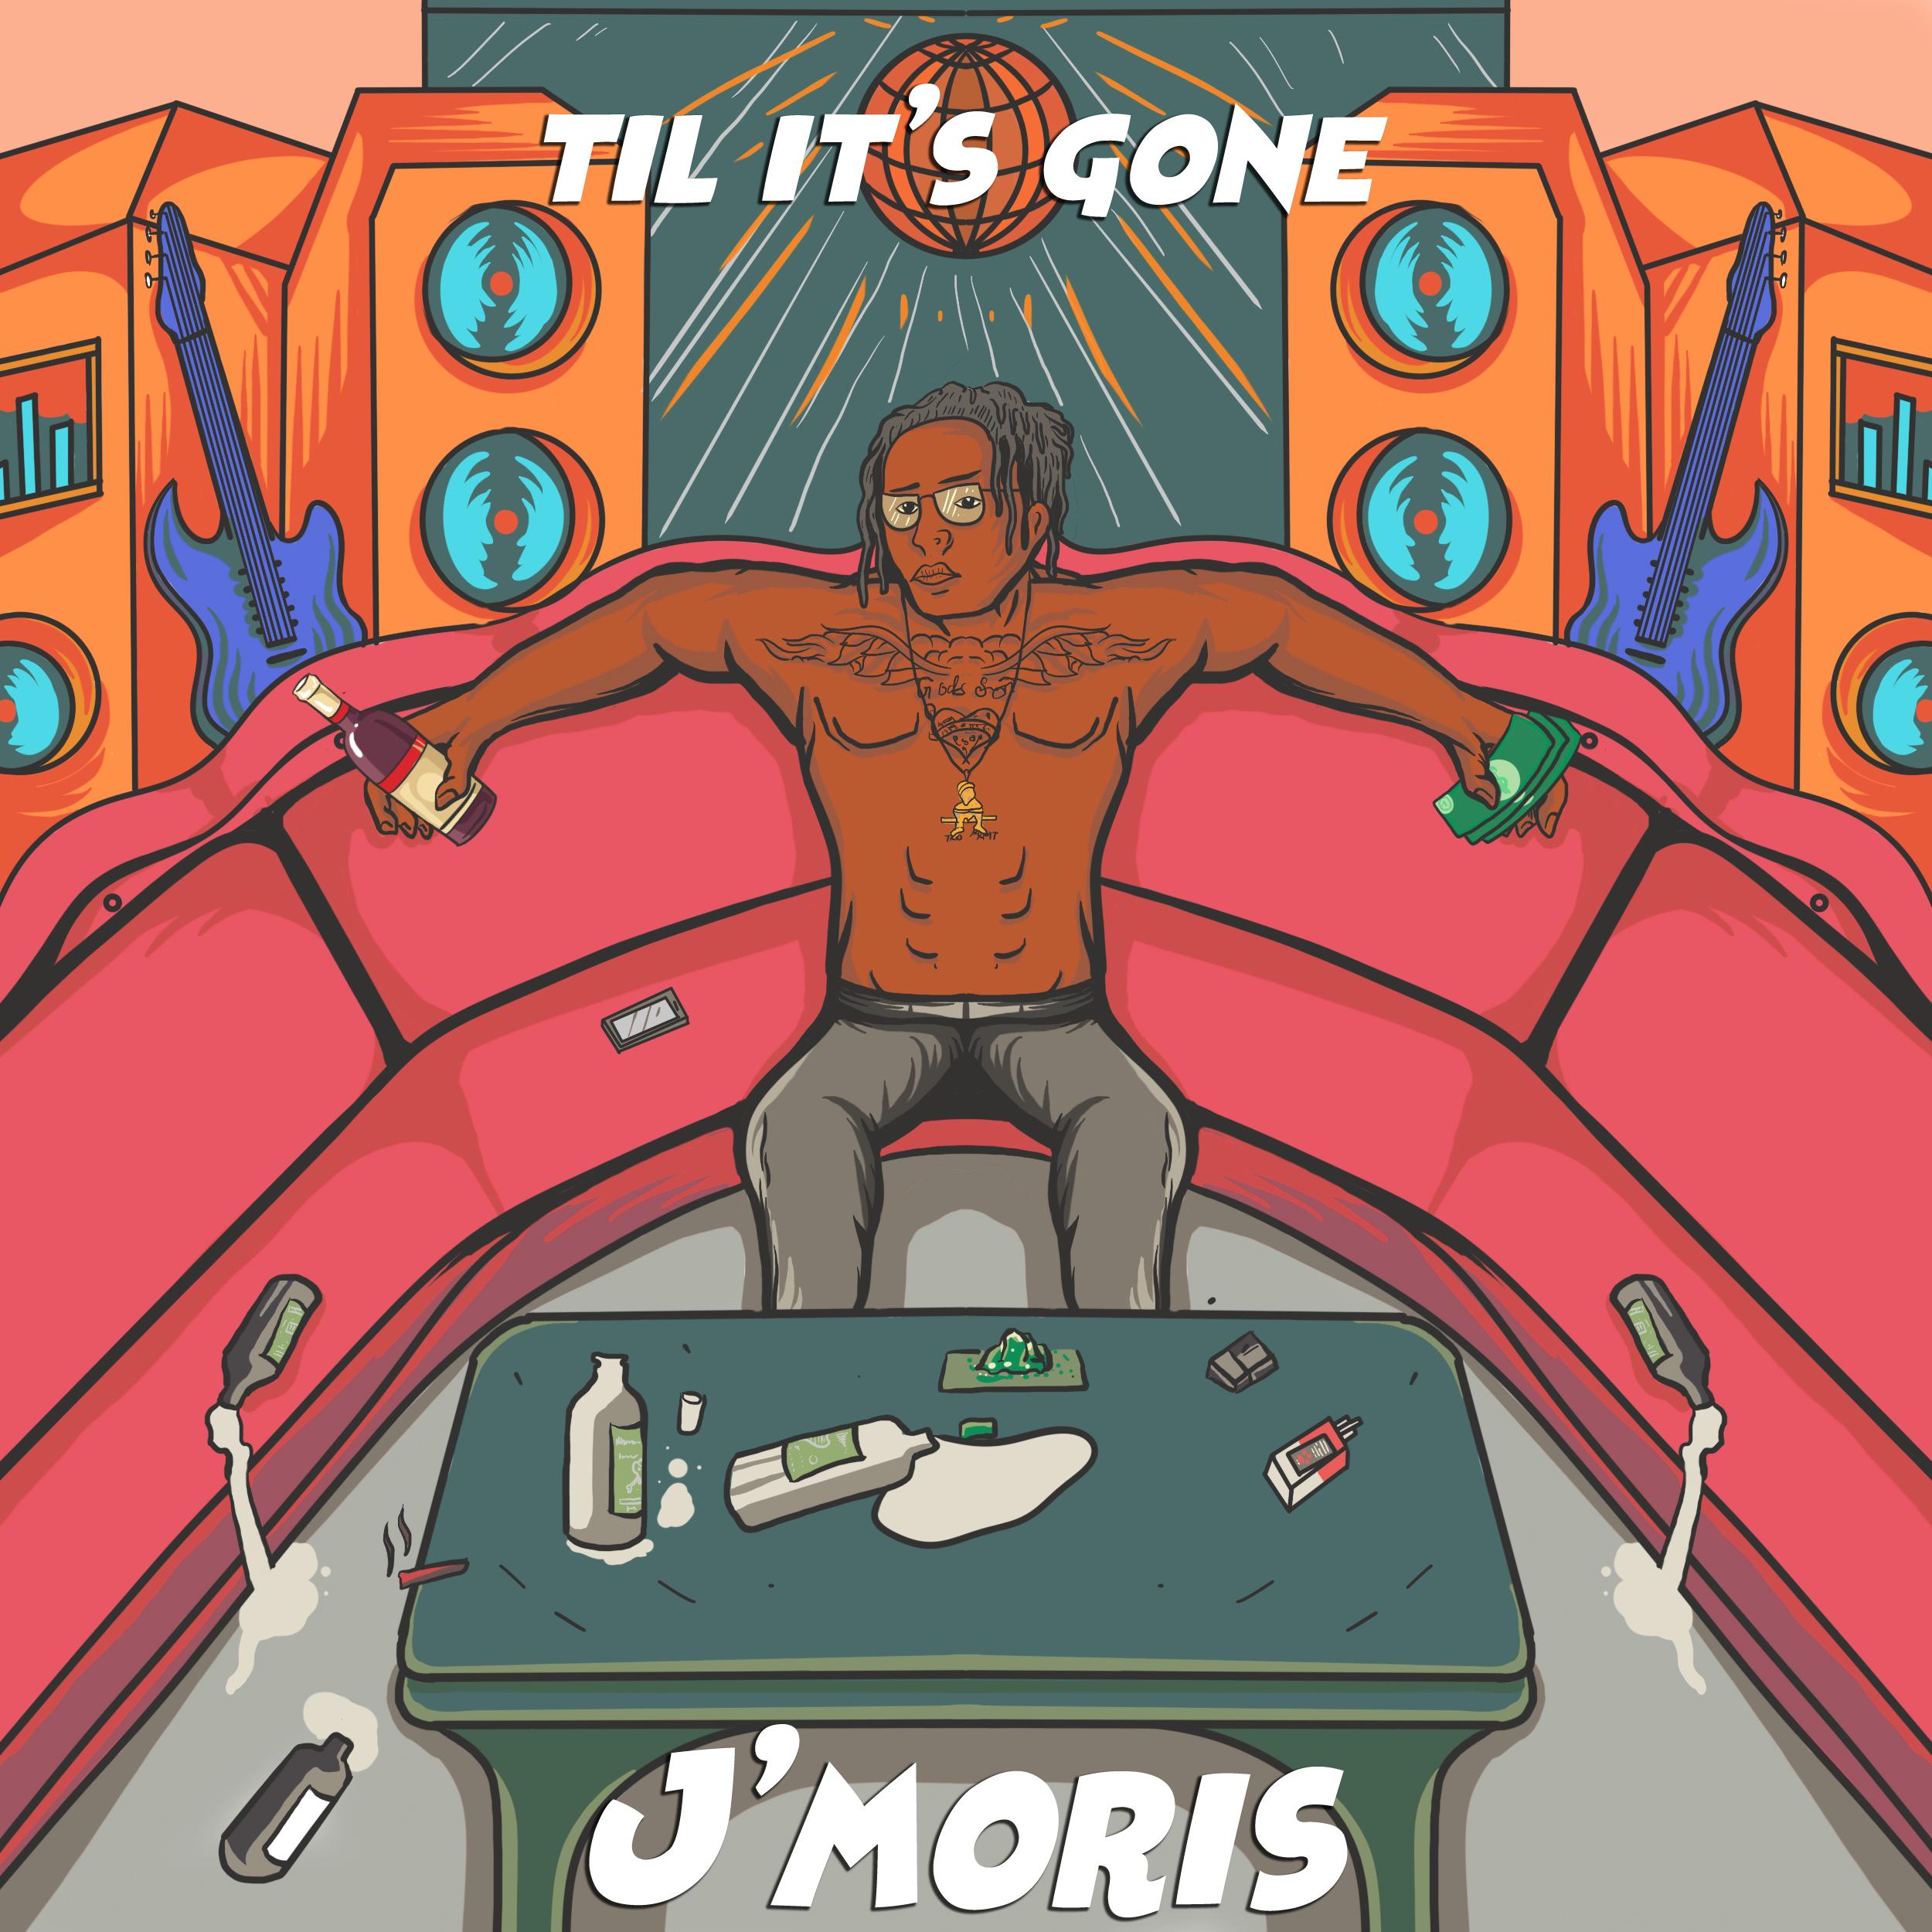 J. Morris, Til It's Gone